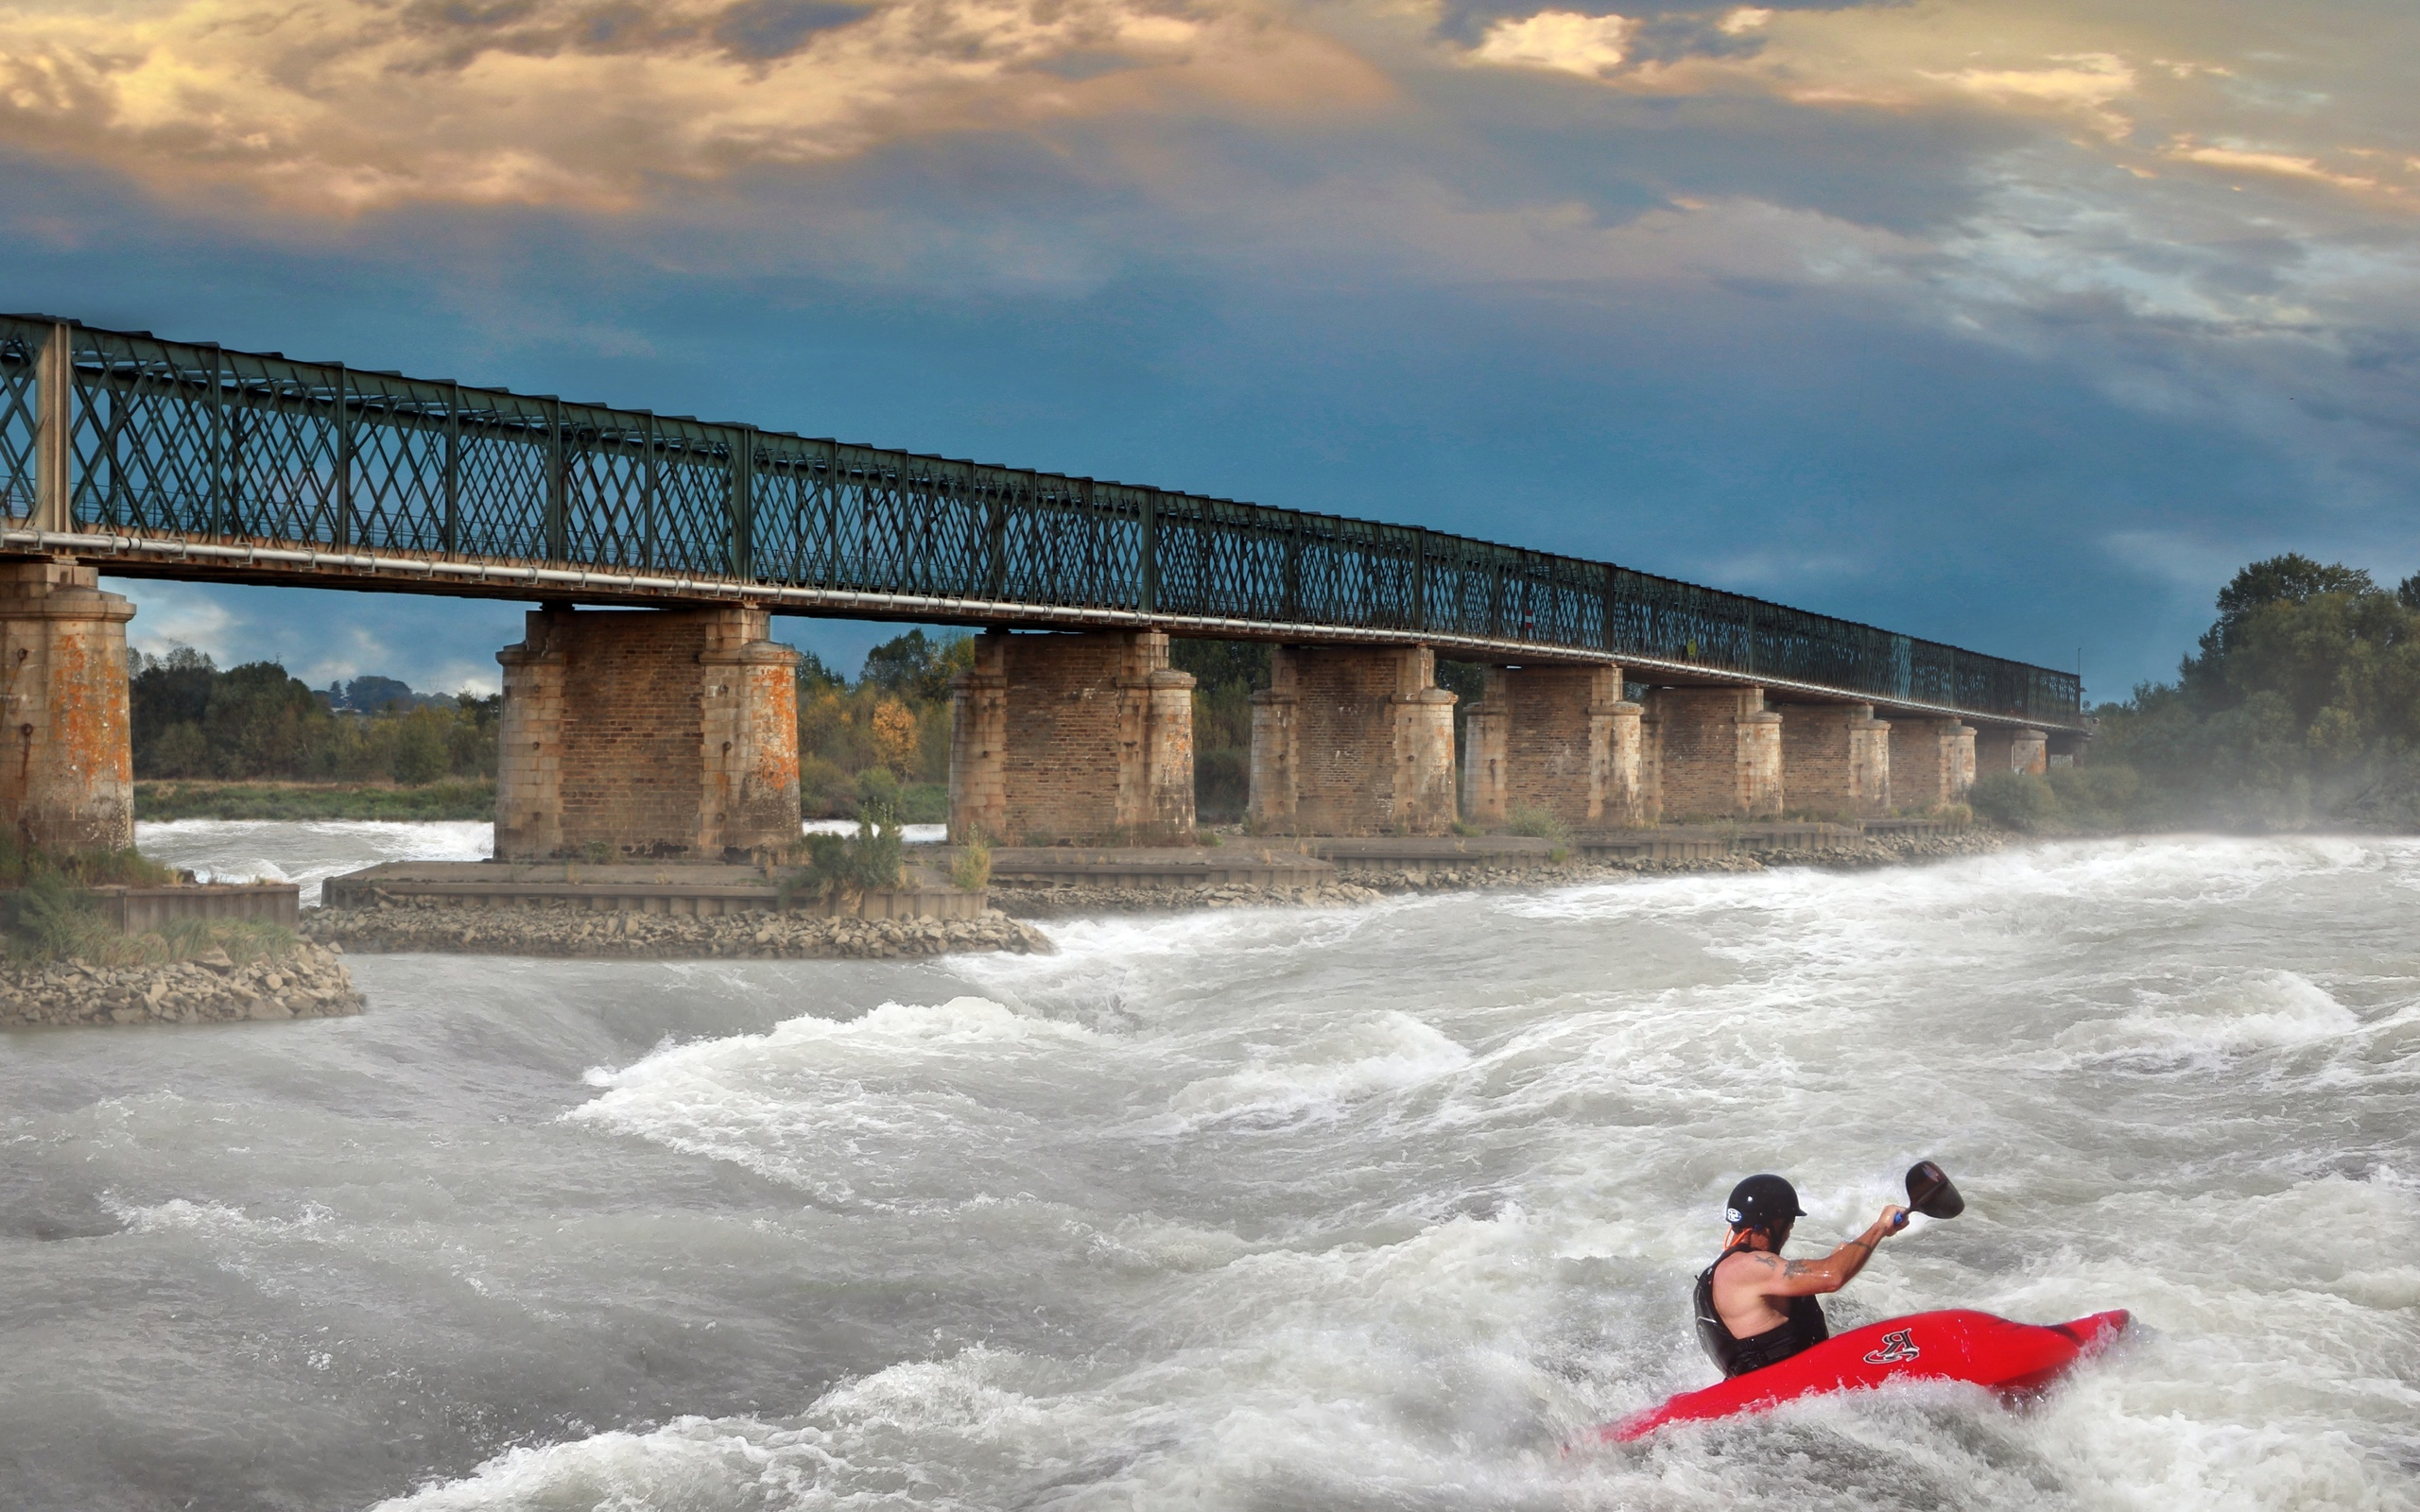 река, мост, рафтинг, речной, фотошоп